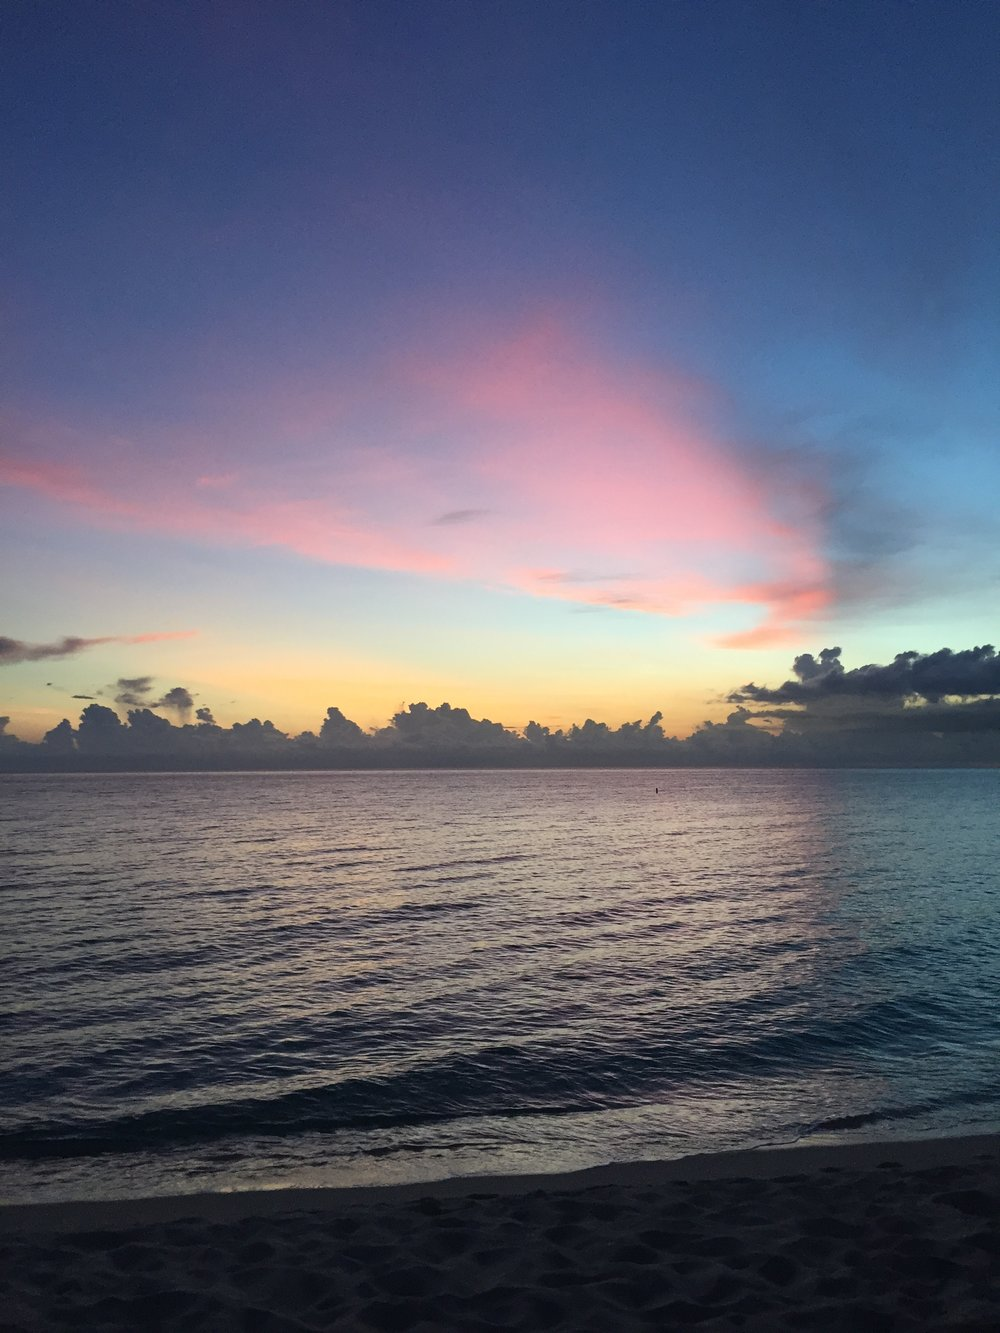 Cayman Islands' 7 Mile Beach at Sunset - 2016